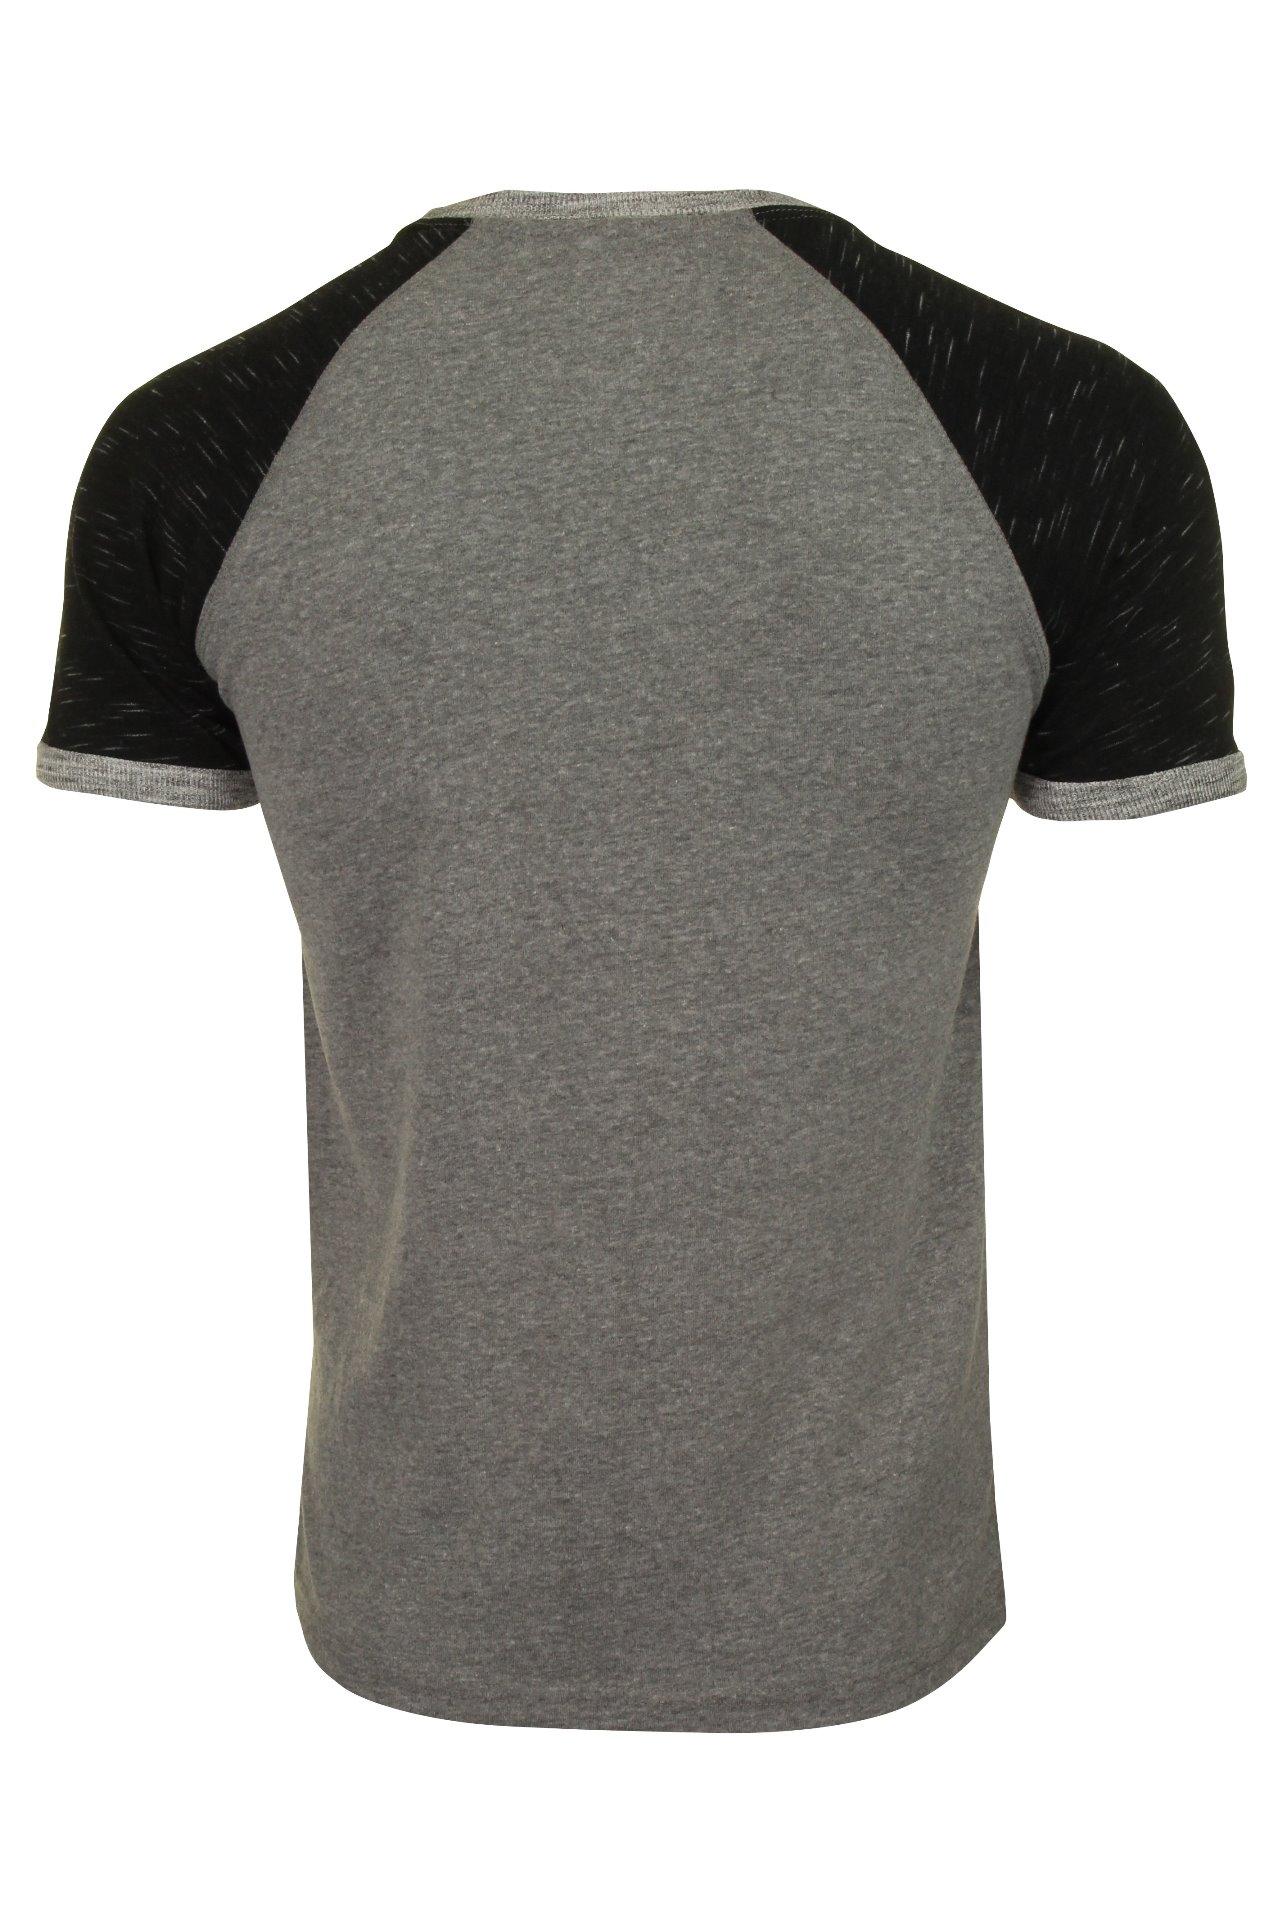 Superdry-T-shirt-homme-034-Premium-Goods-Raglan-Tee-034-a-Manches-Courtes miniature 8